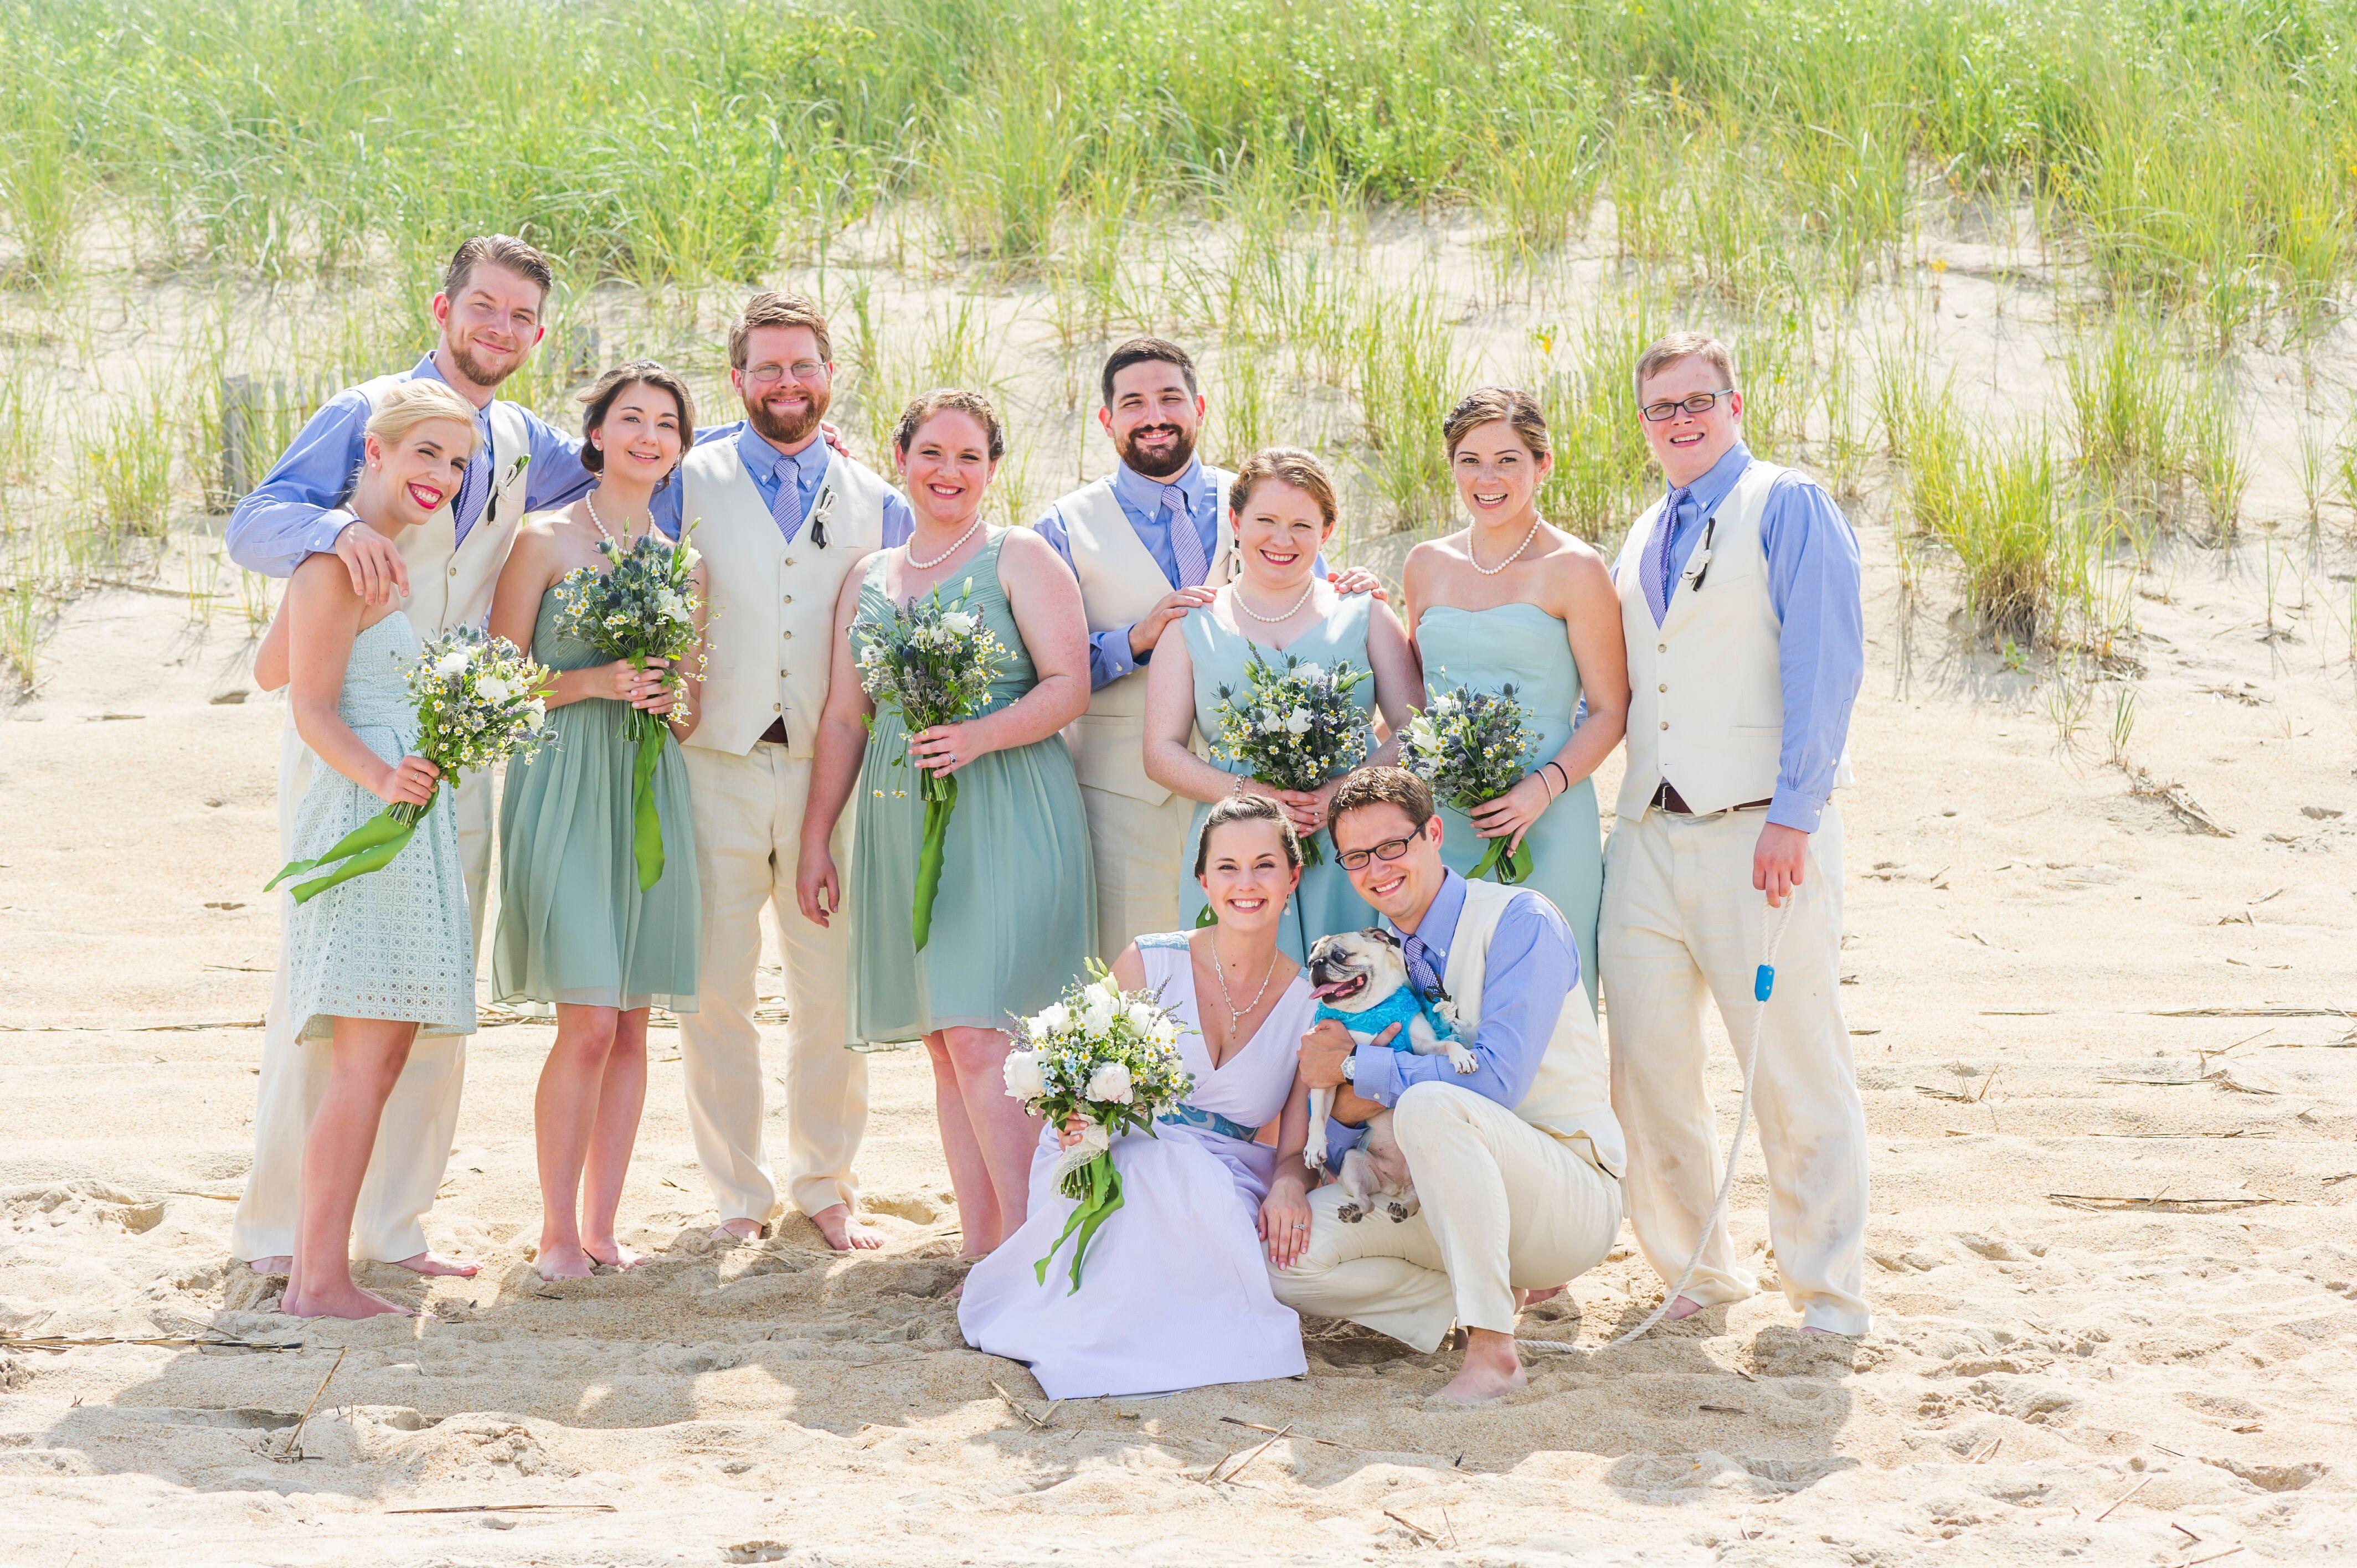 J.Crew Mint Seaglass-Inspired Bridesmaid Dresses